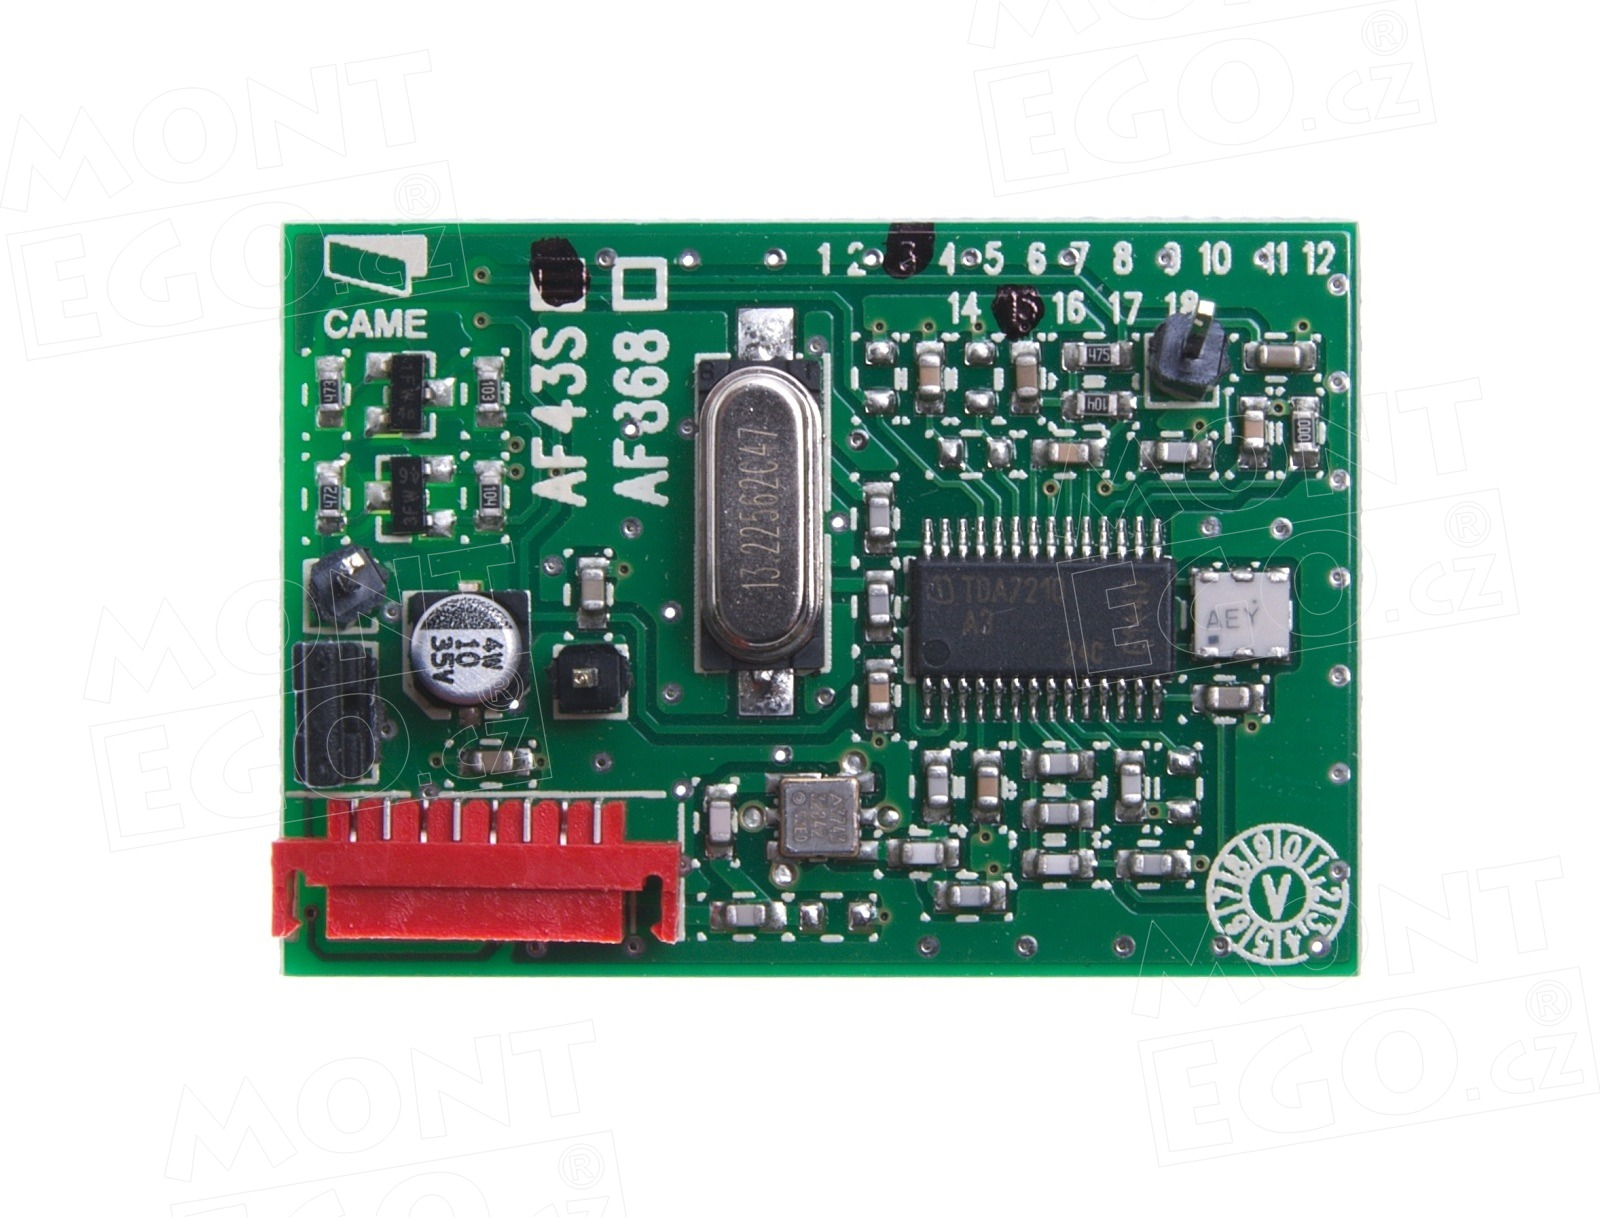 Karta zásuvného přijímače CAME AF43S, 2 kanály, 433 MHz, pevný kód